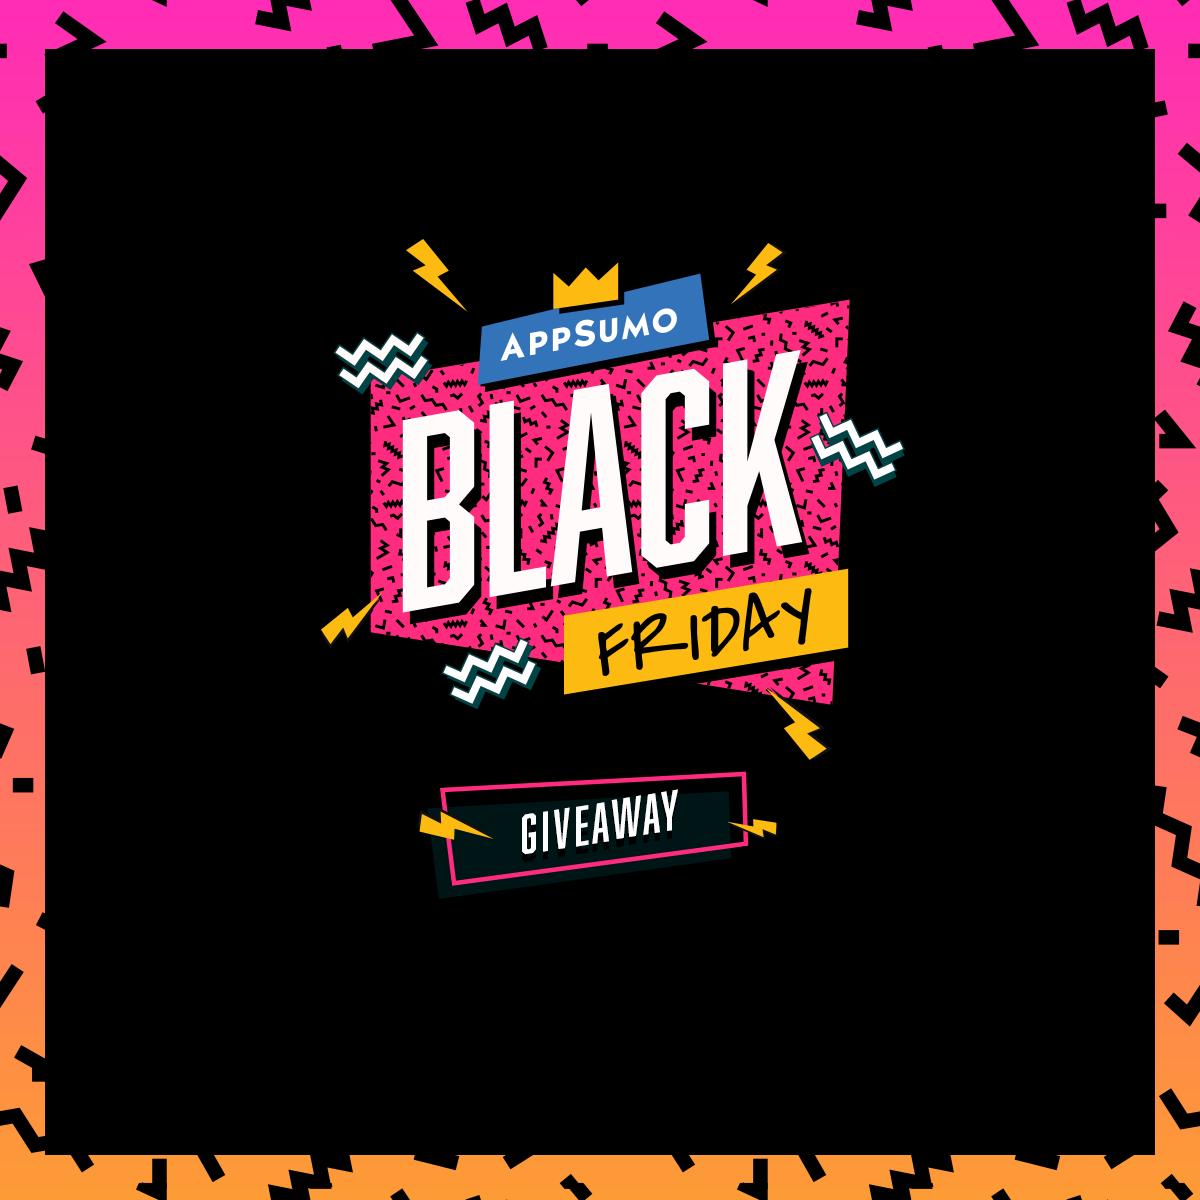 Appsumo Black Friday Giveaway